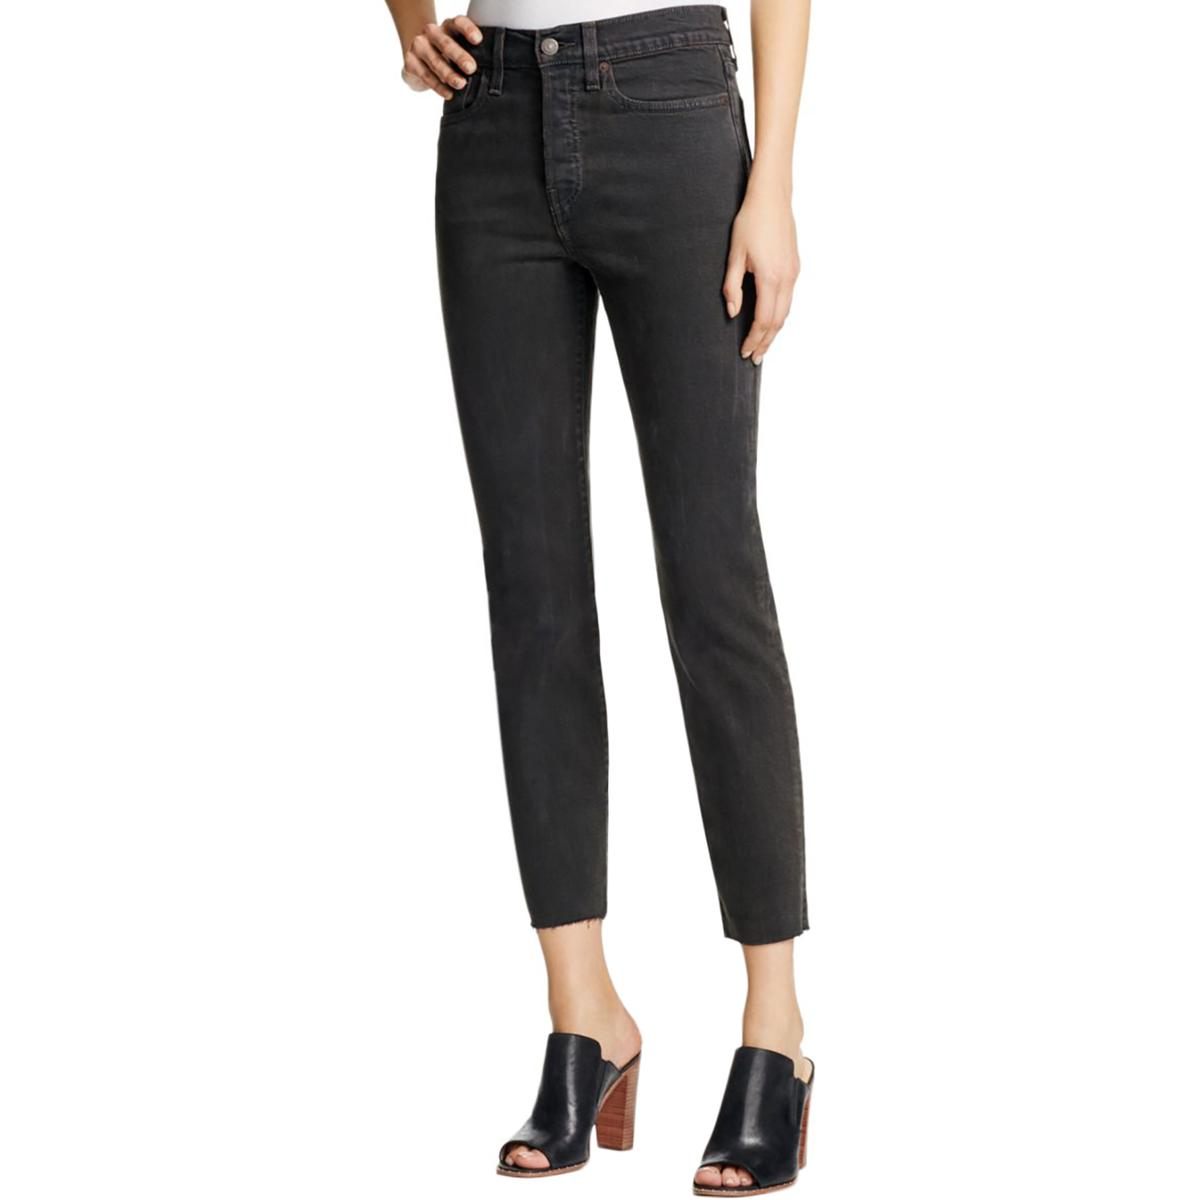 Levi's Womens Raw Hem High Rise Ankle Jeans